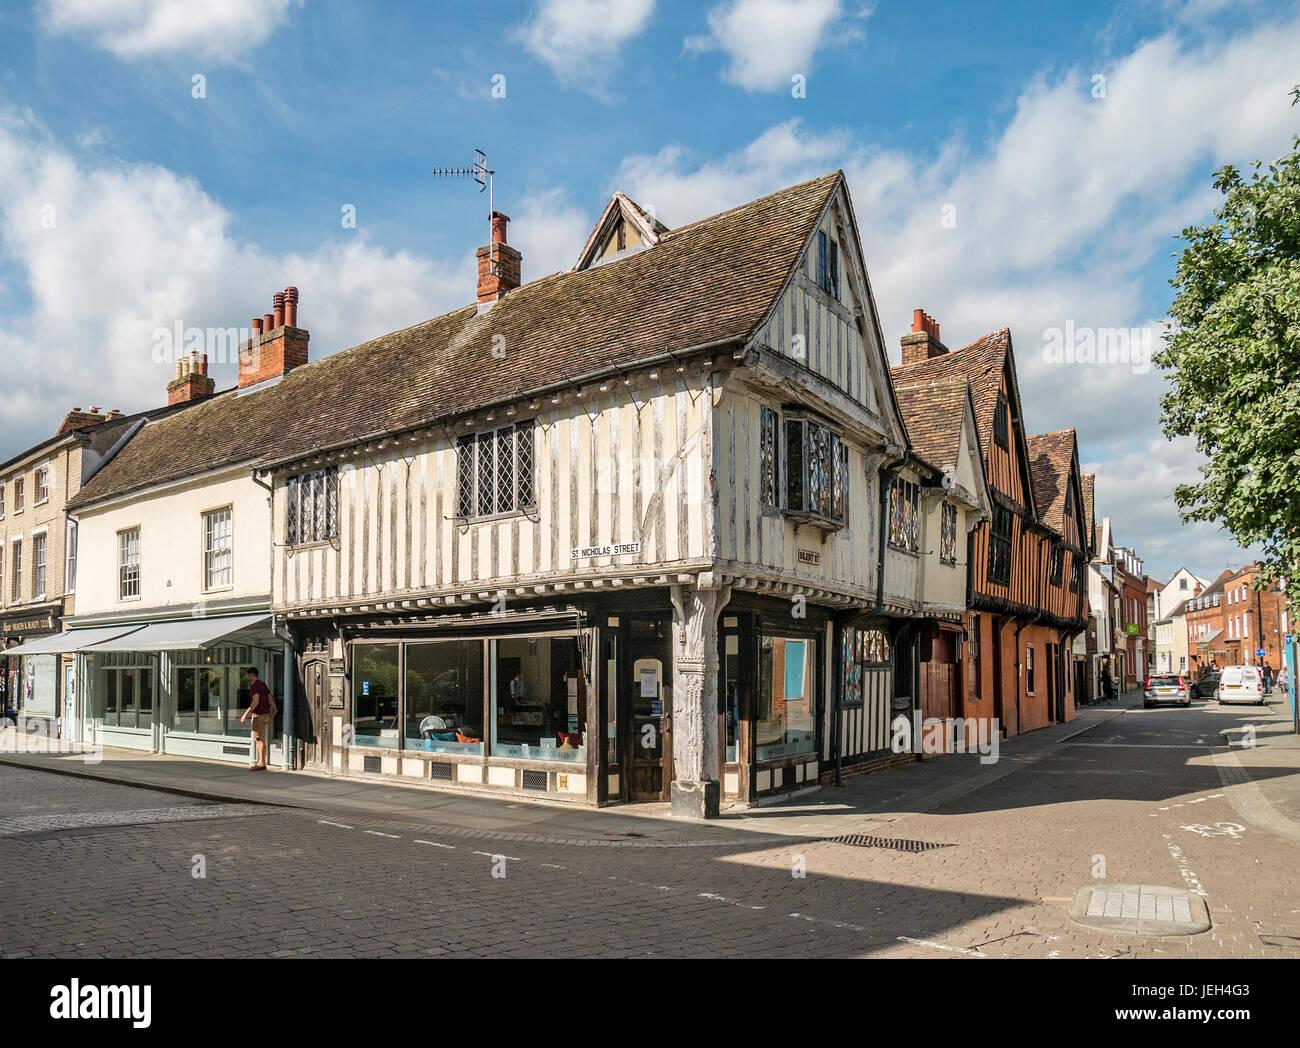 Curson Lodge a rare survivor of an early Tudor Inn Ipswich Suffolk UK restored in 2007 - Stock Image